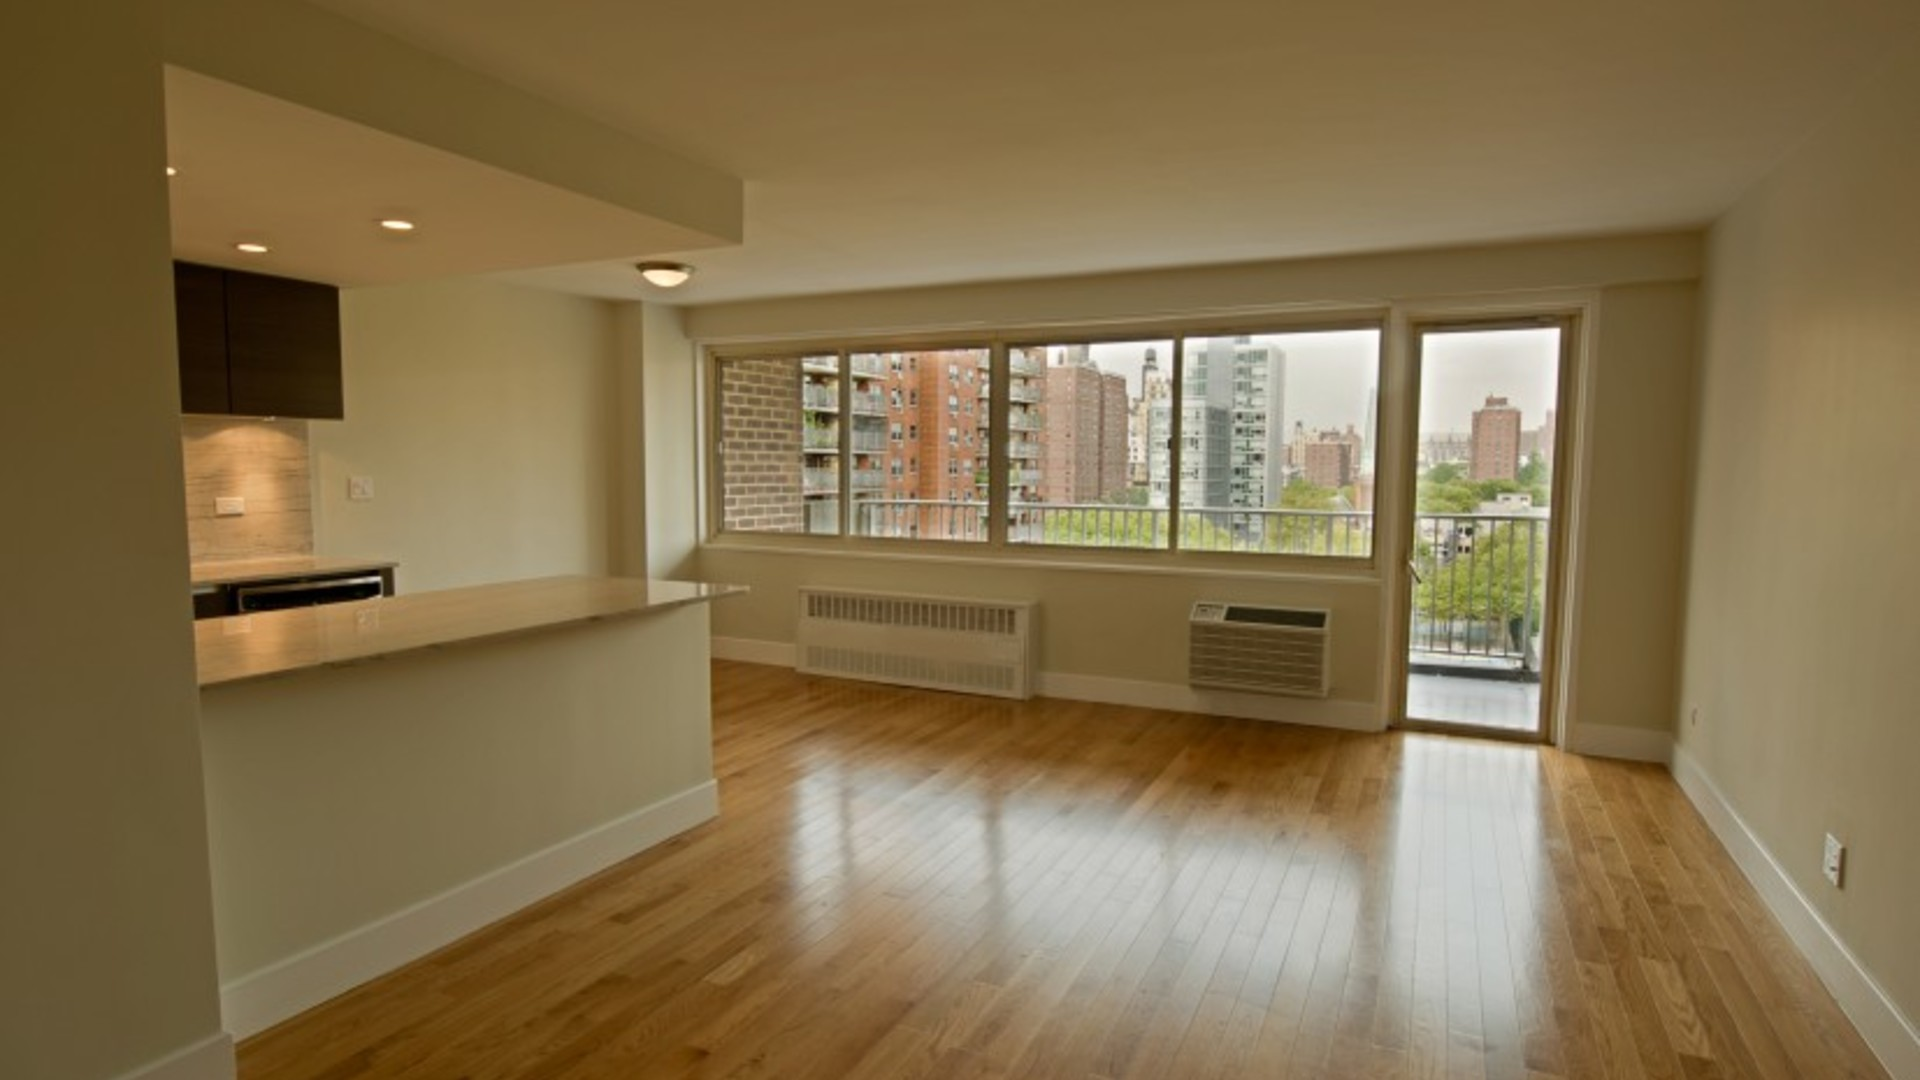 A 3300 Apartment In Upper West Side Manhattan Nooklyn